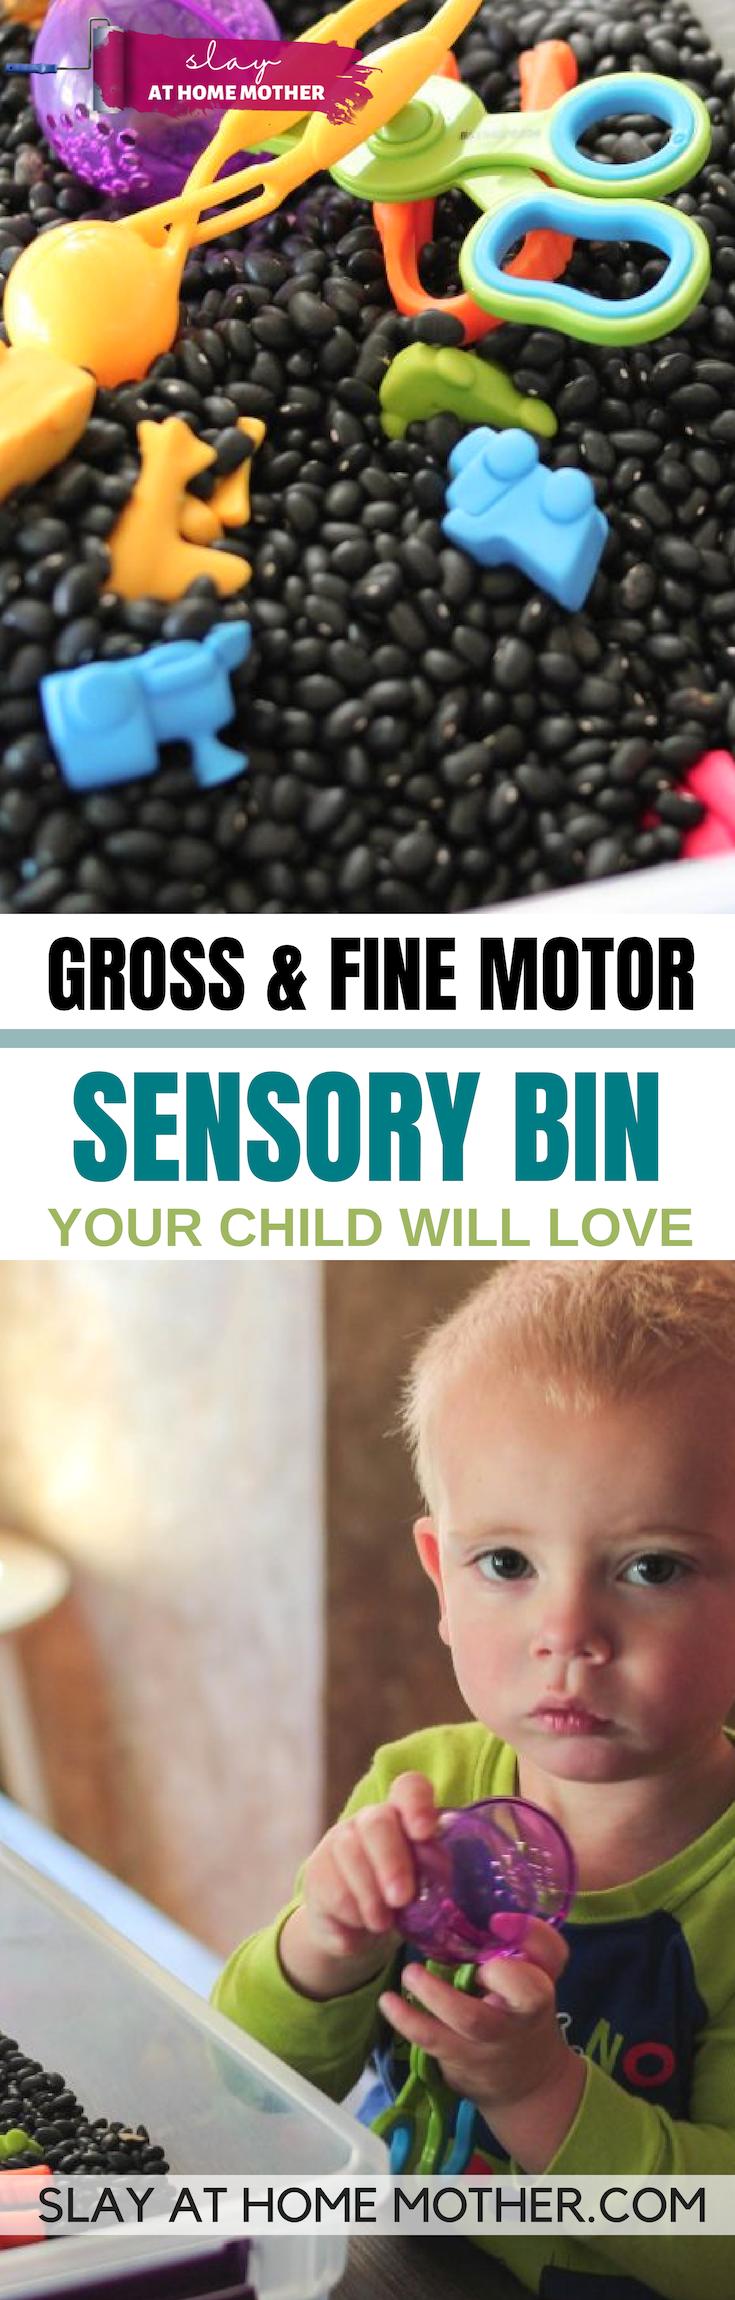 Toddler Sensory Bin That Encourages Gross And Fine Motor Skills #sensorybin #sensory #spd #slayathomemother - SLAYathomemother.com